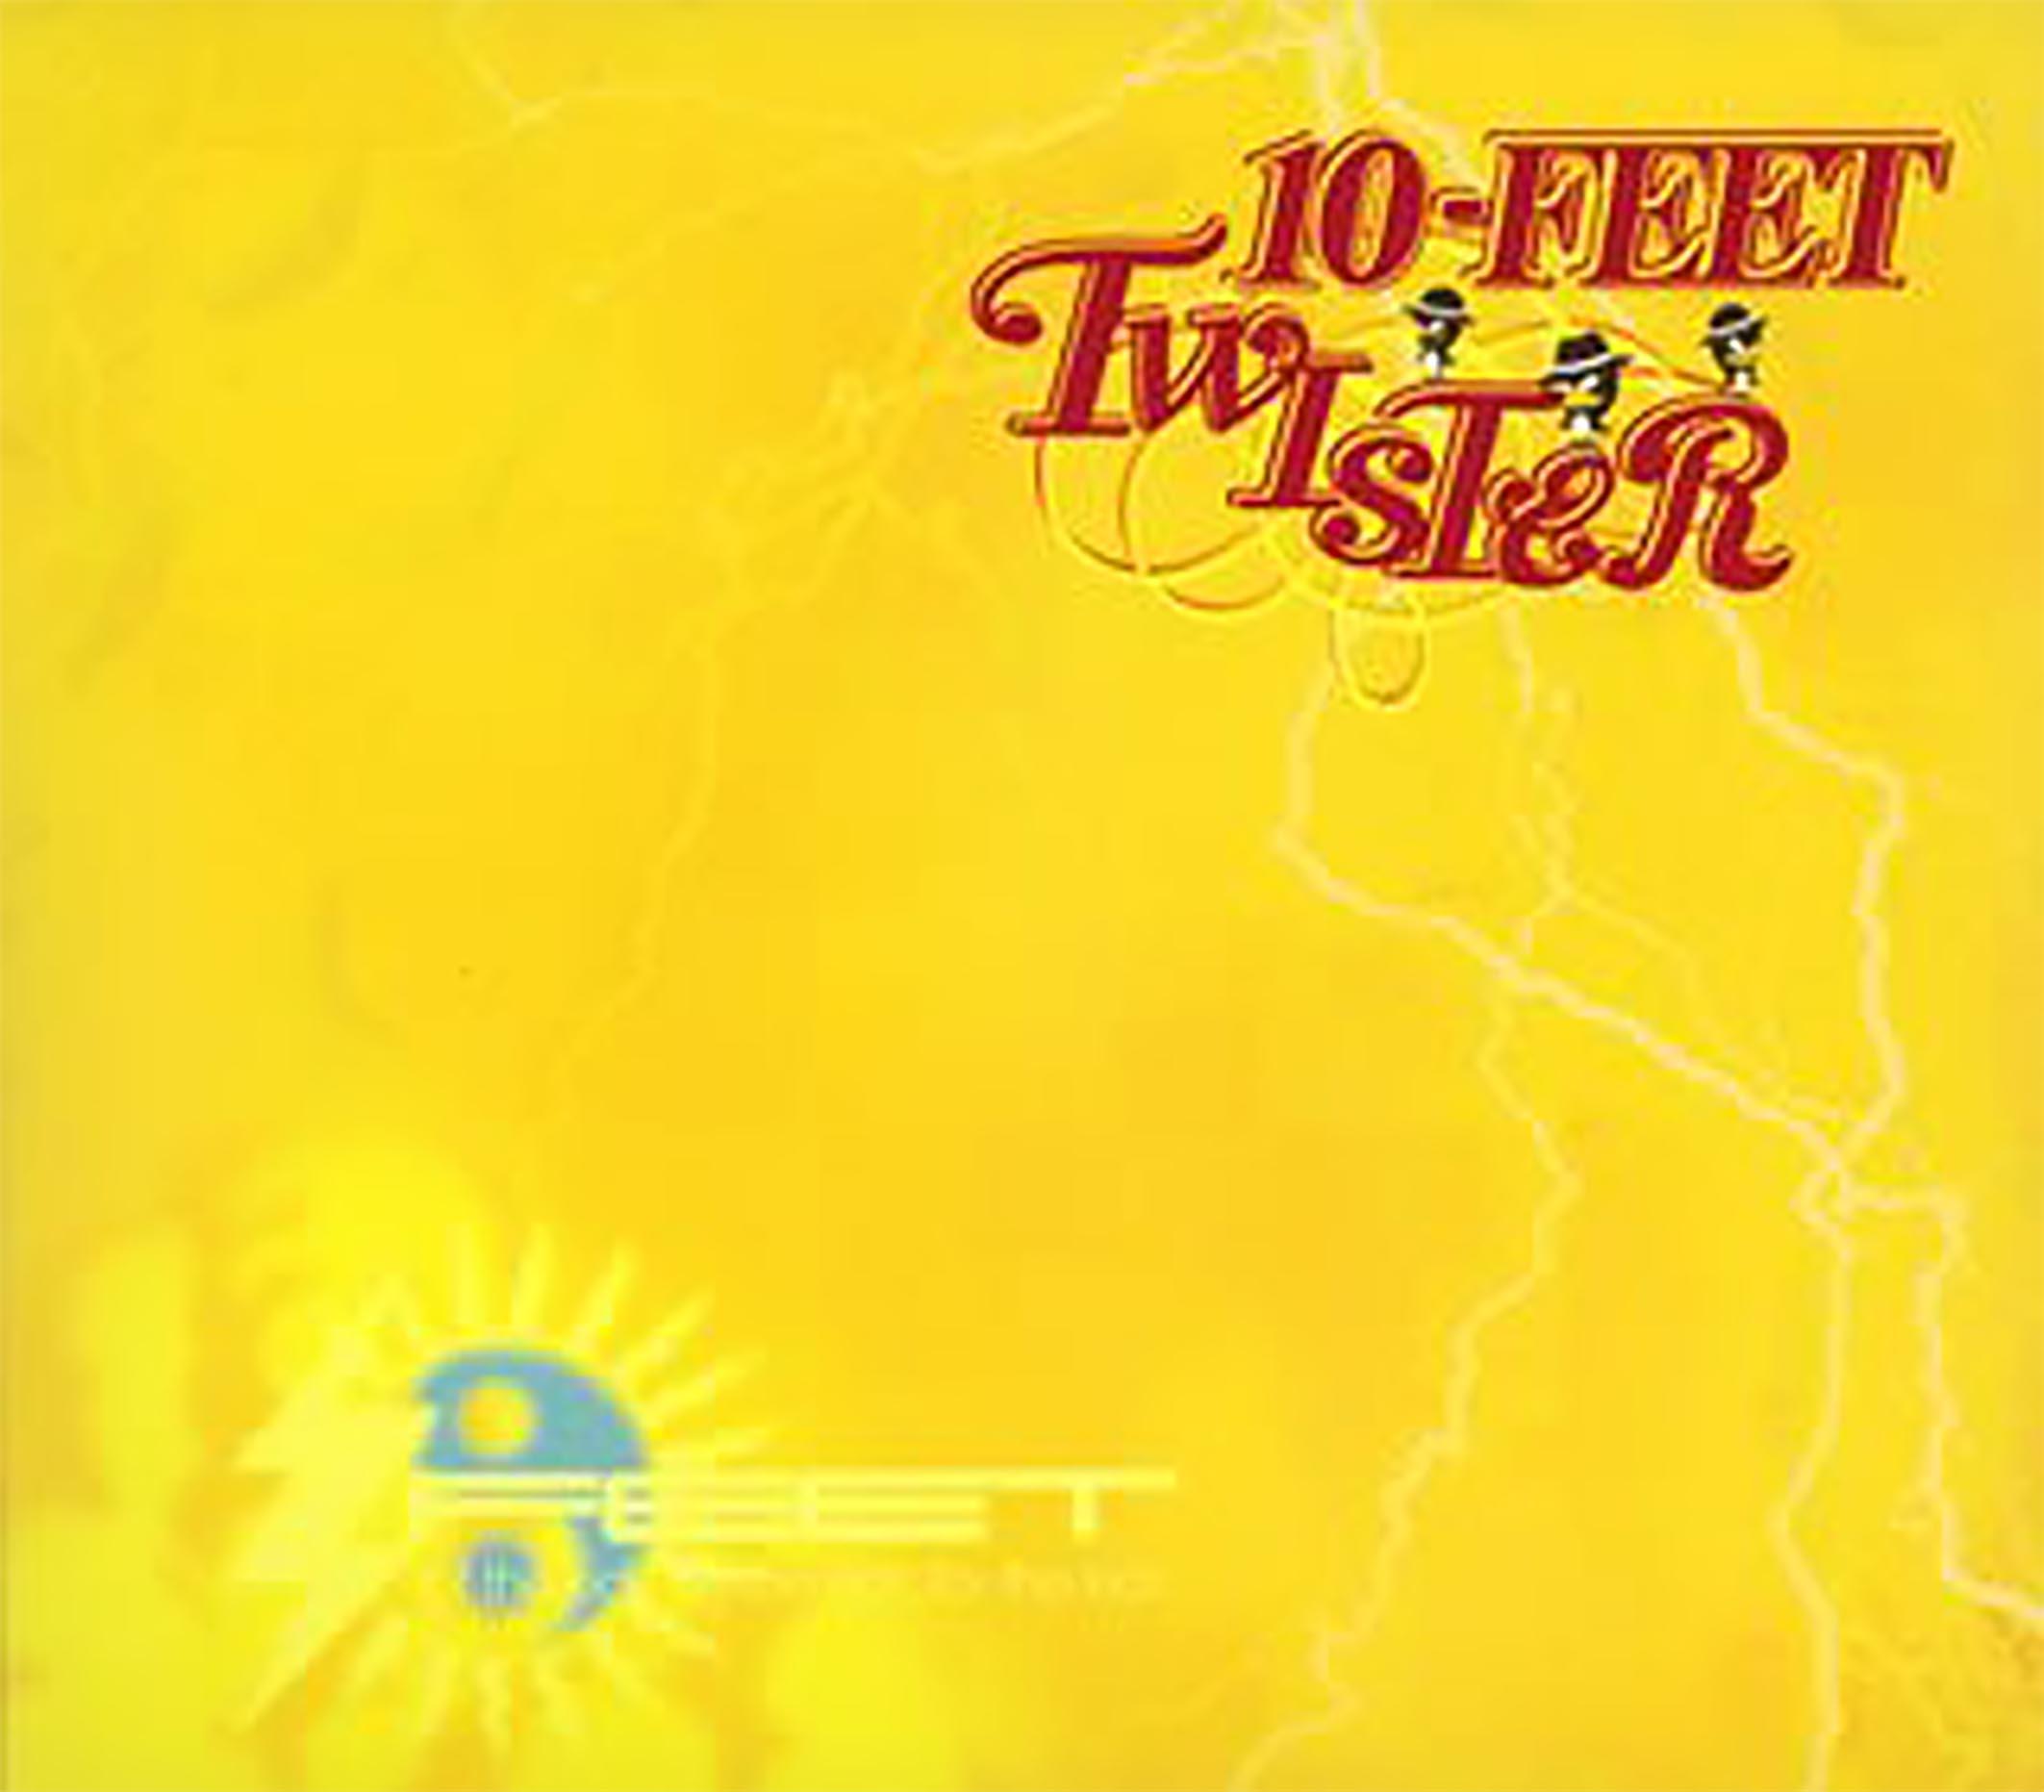 「NO WAY」収録アルバム『TWISTER』/10-FEET